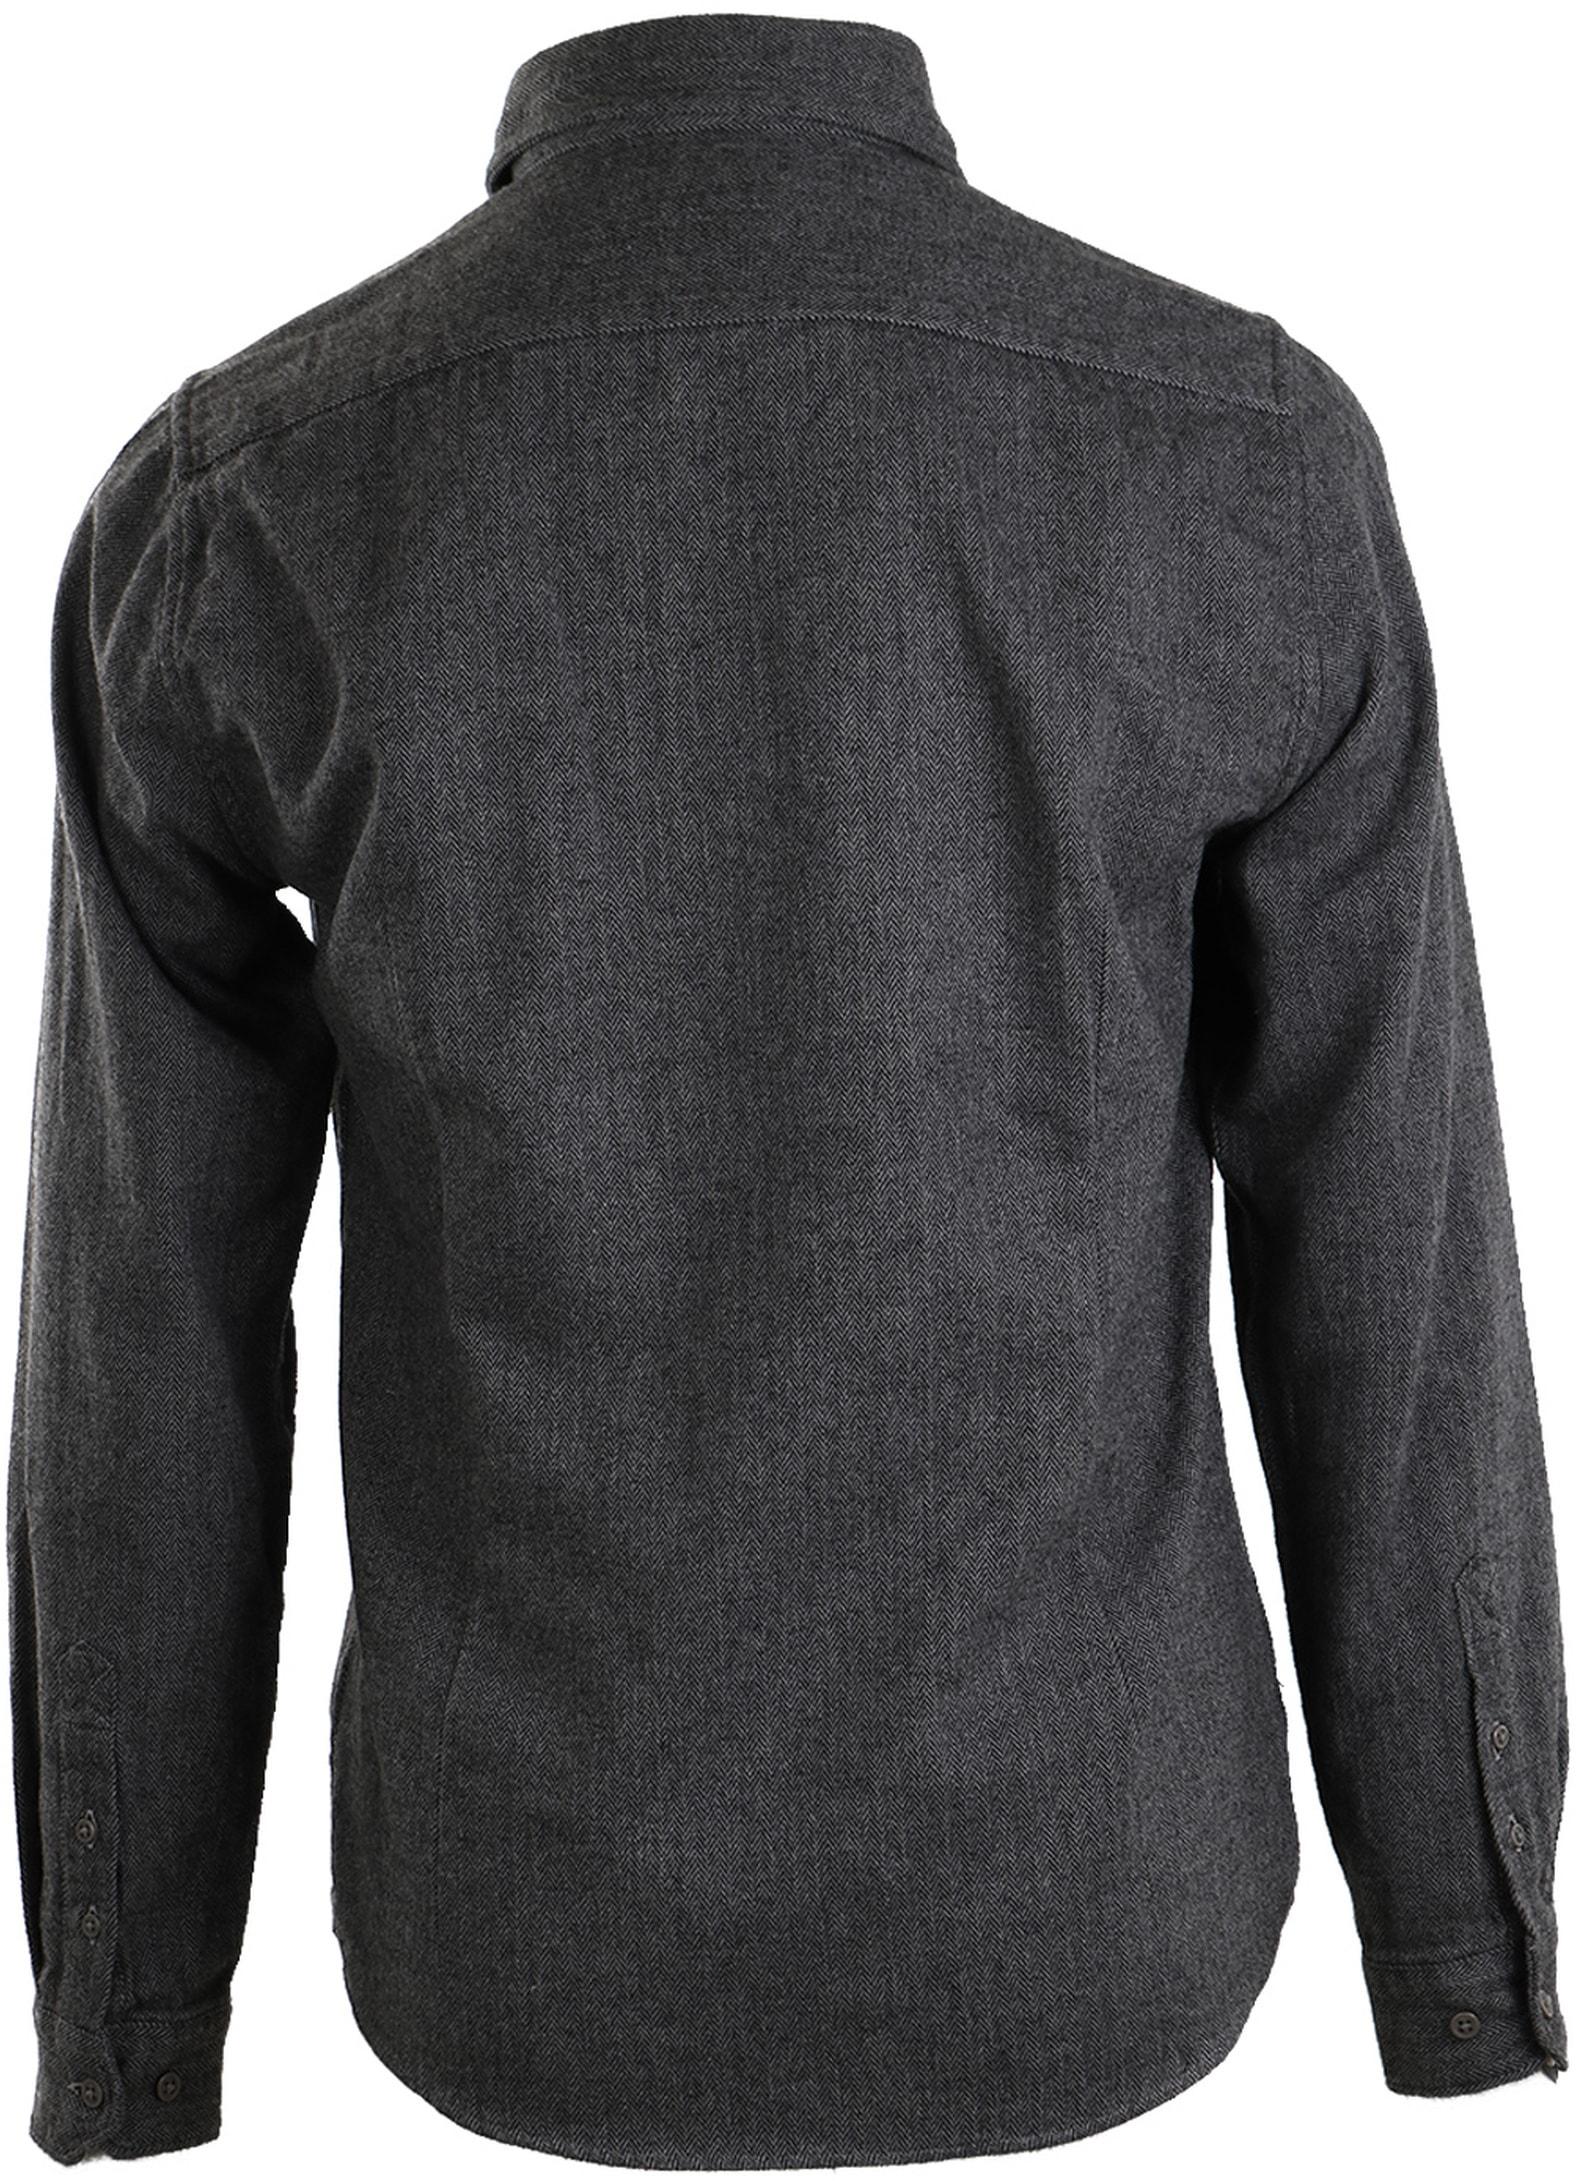 Barbour Port Shirt Antraciet foto 1